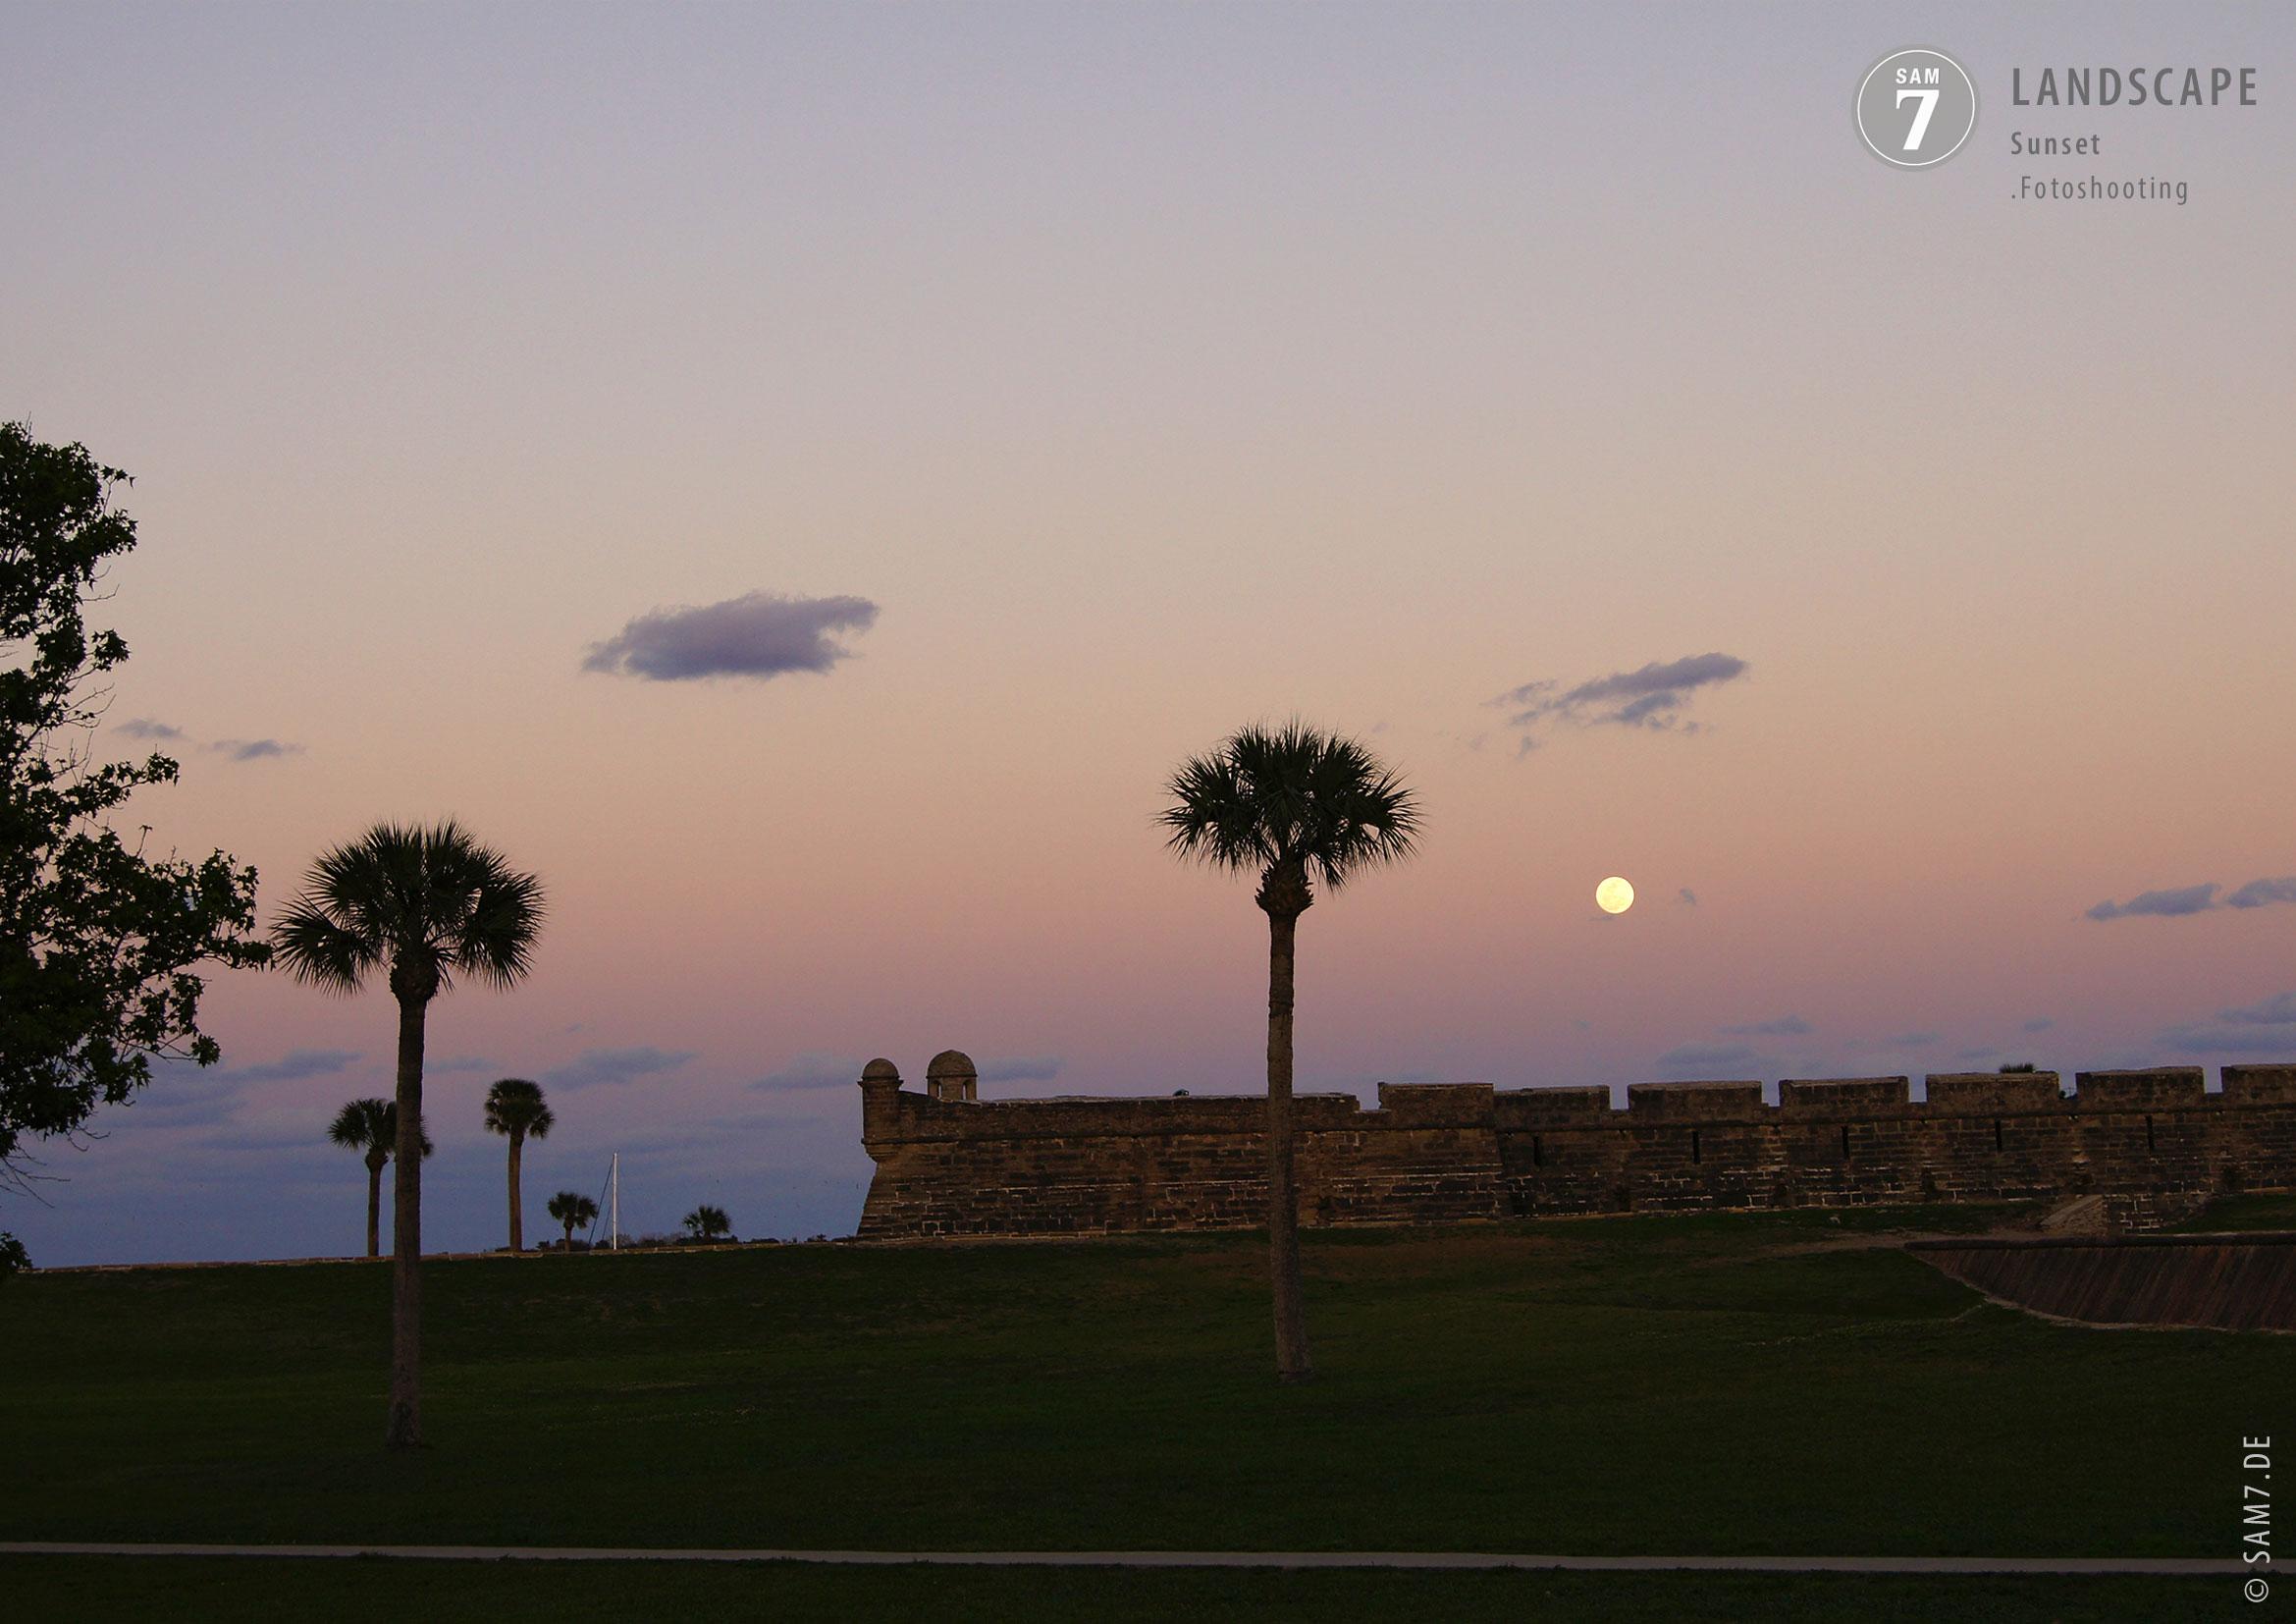 Landscape Photography. Sunset.